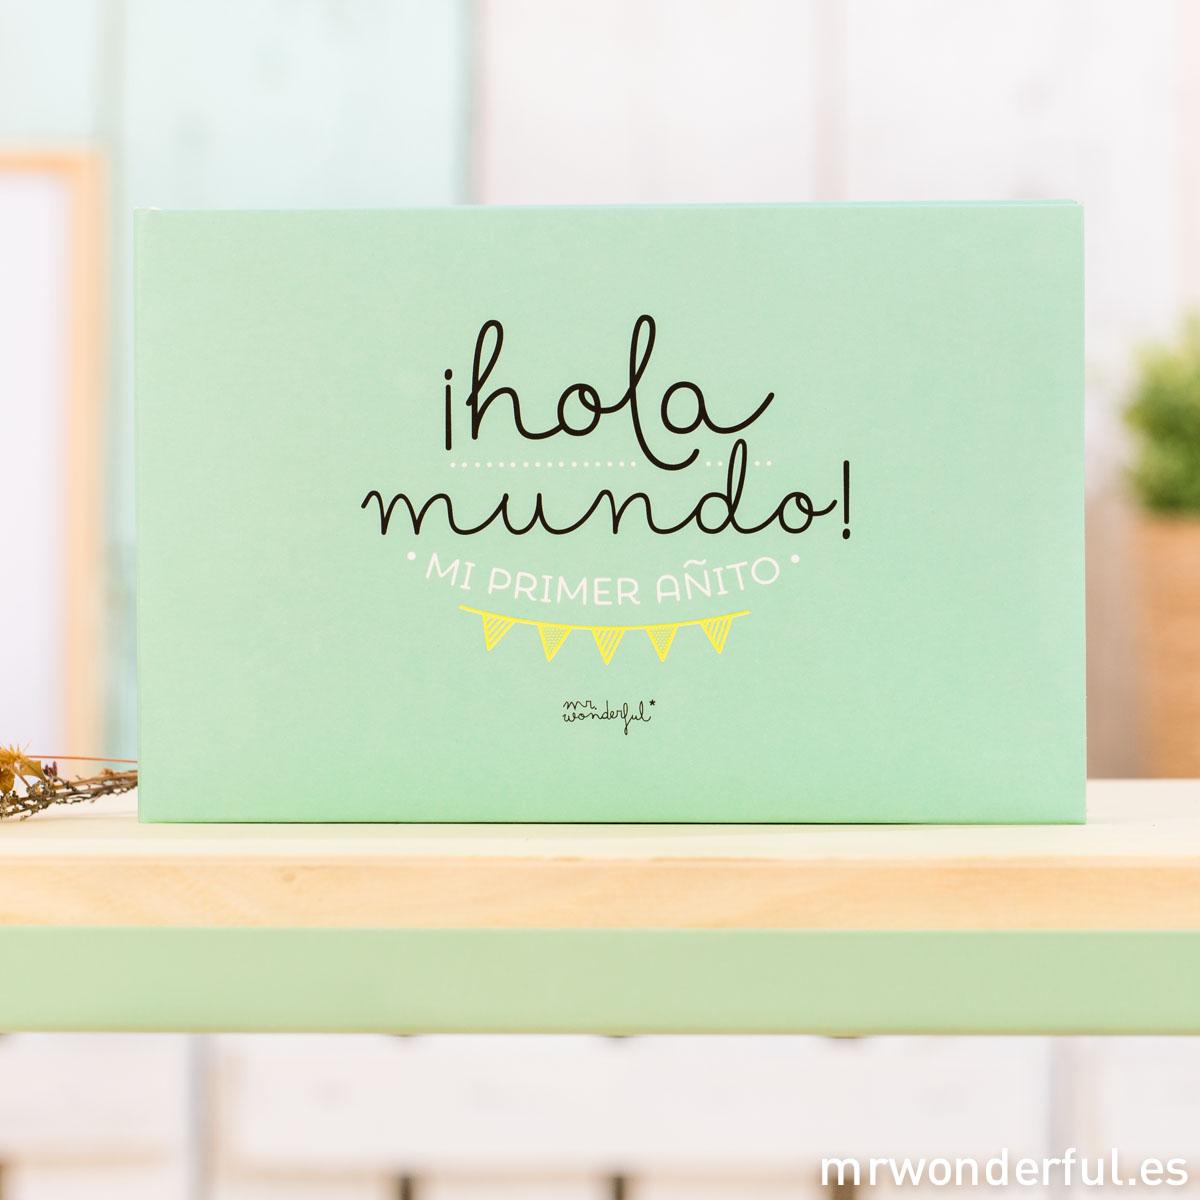 mrwonderful_album-bebe_01_album-1-aniversario-bebe-139